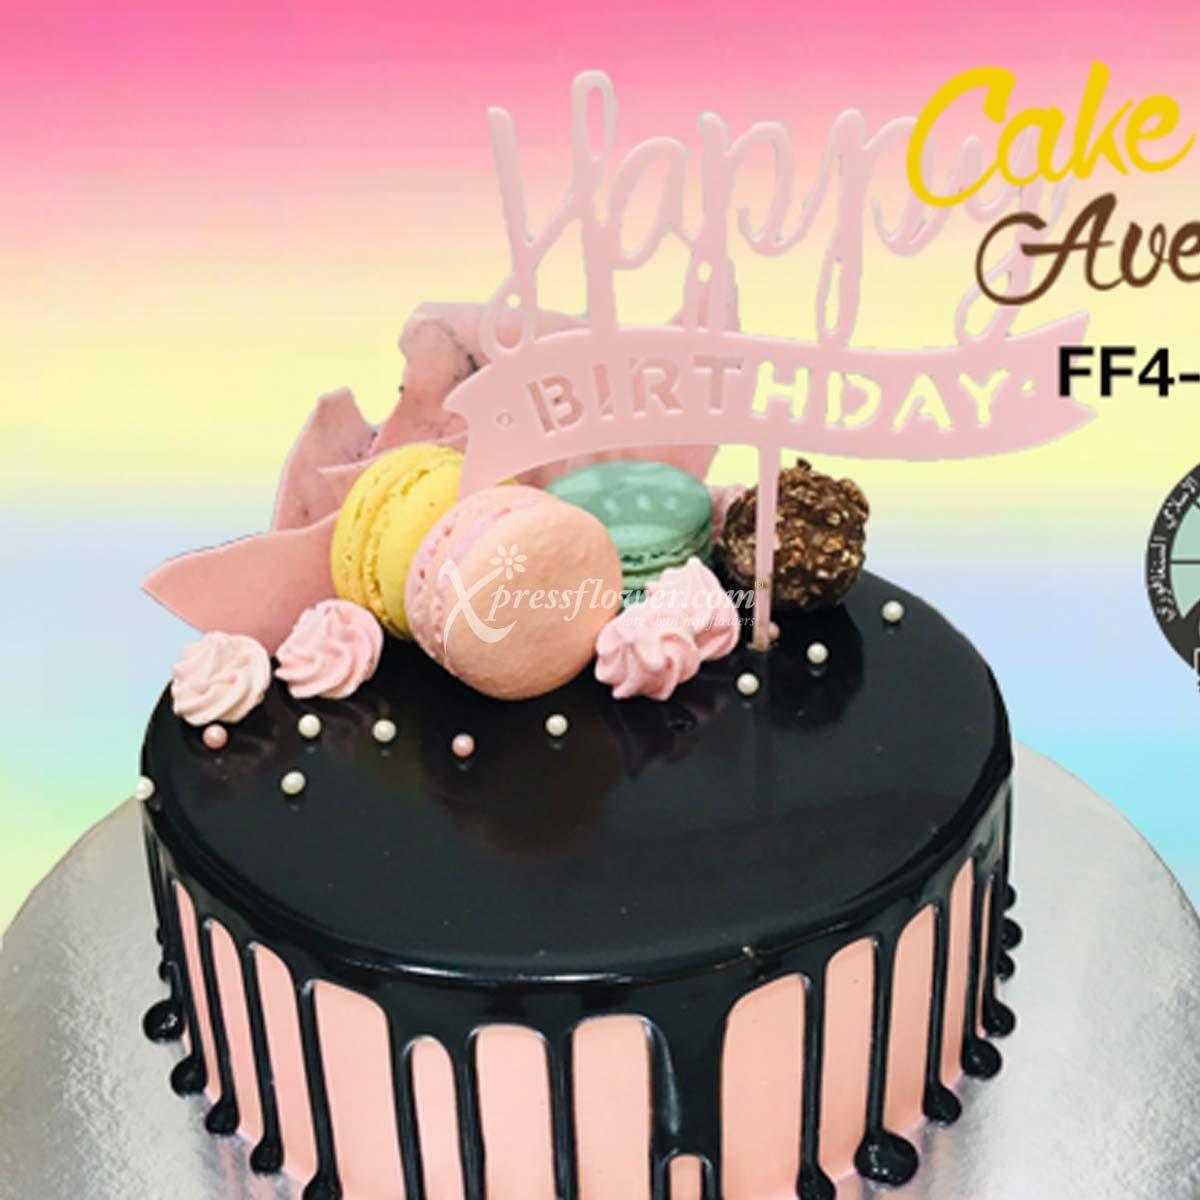 CAC2114 Happy Birthday Pink B